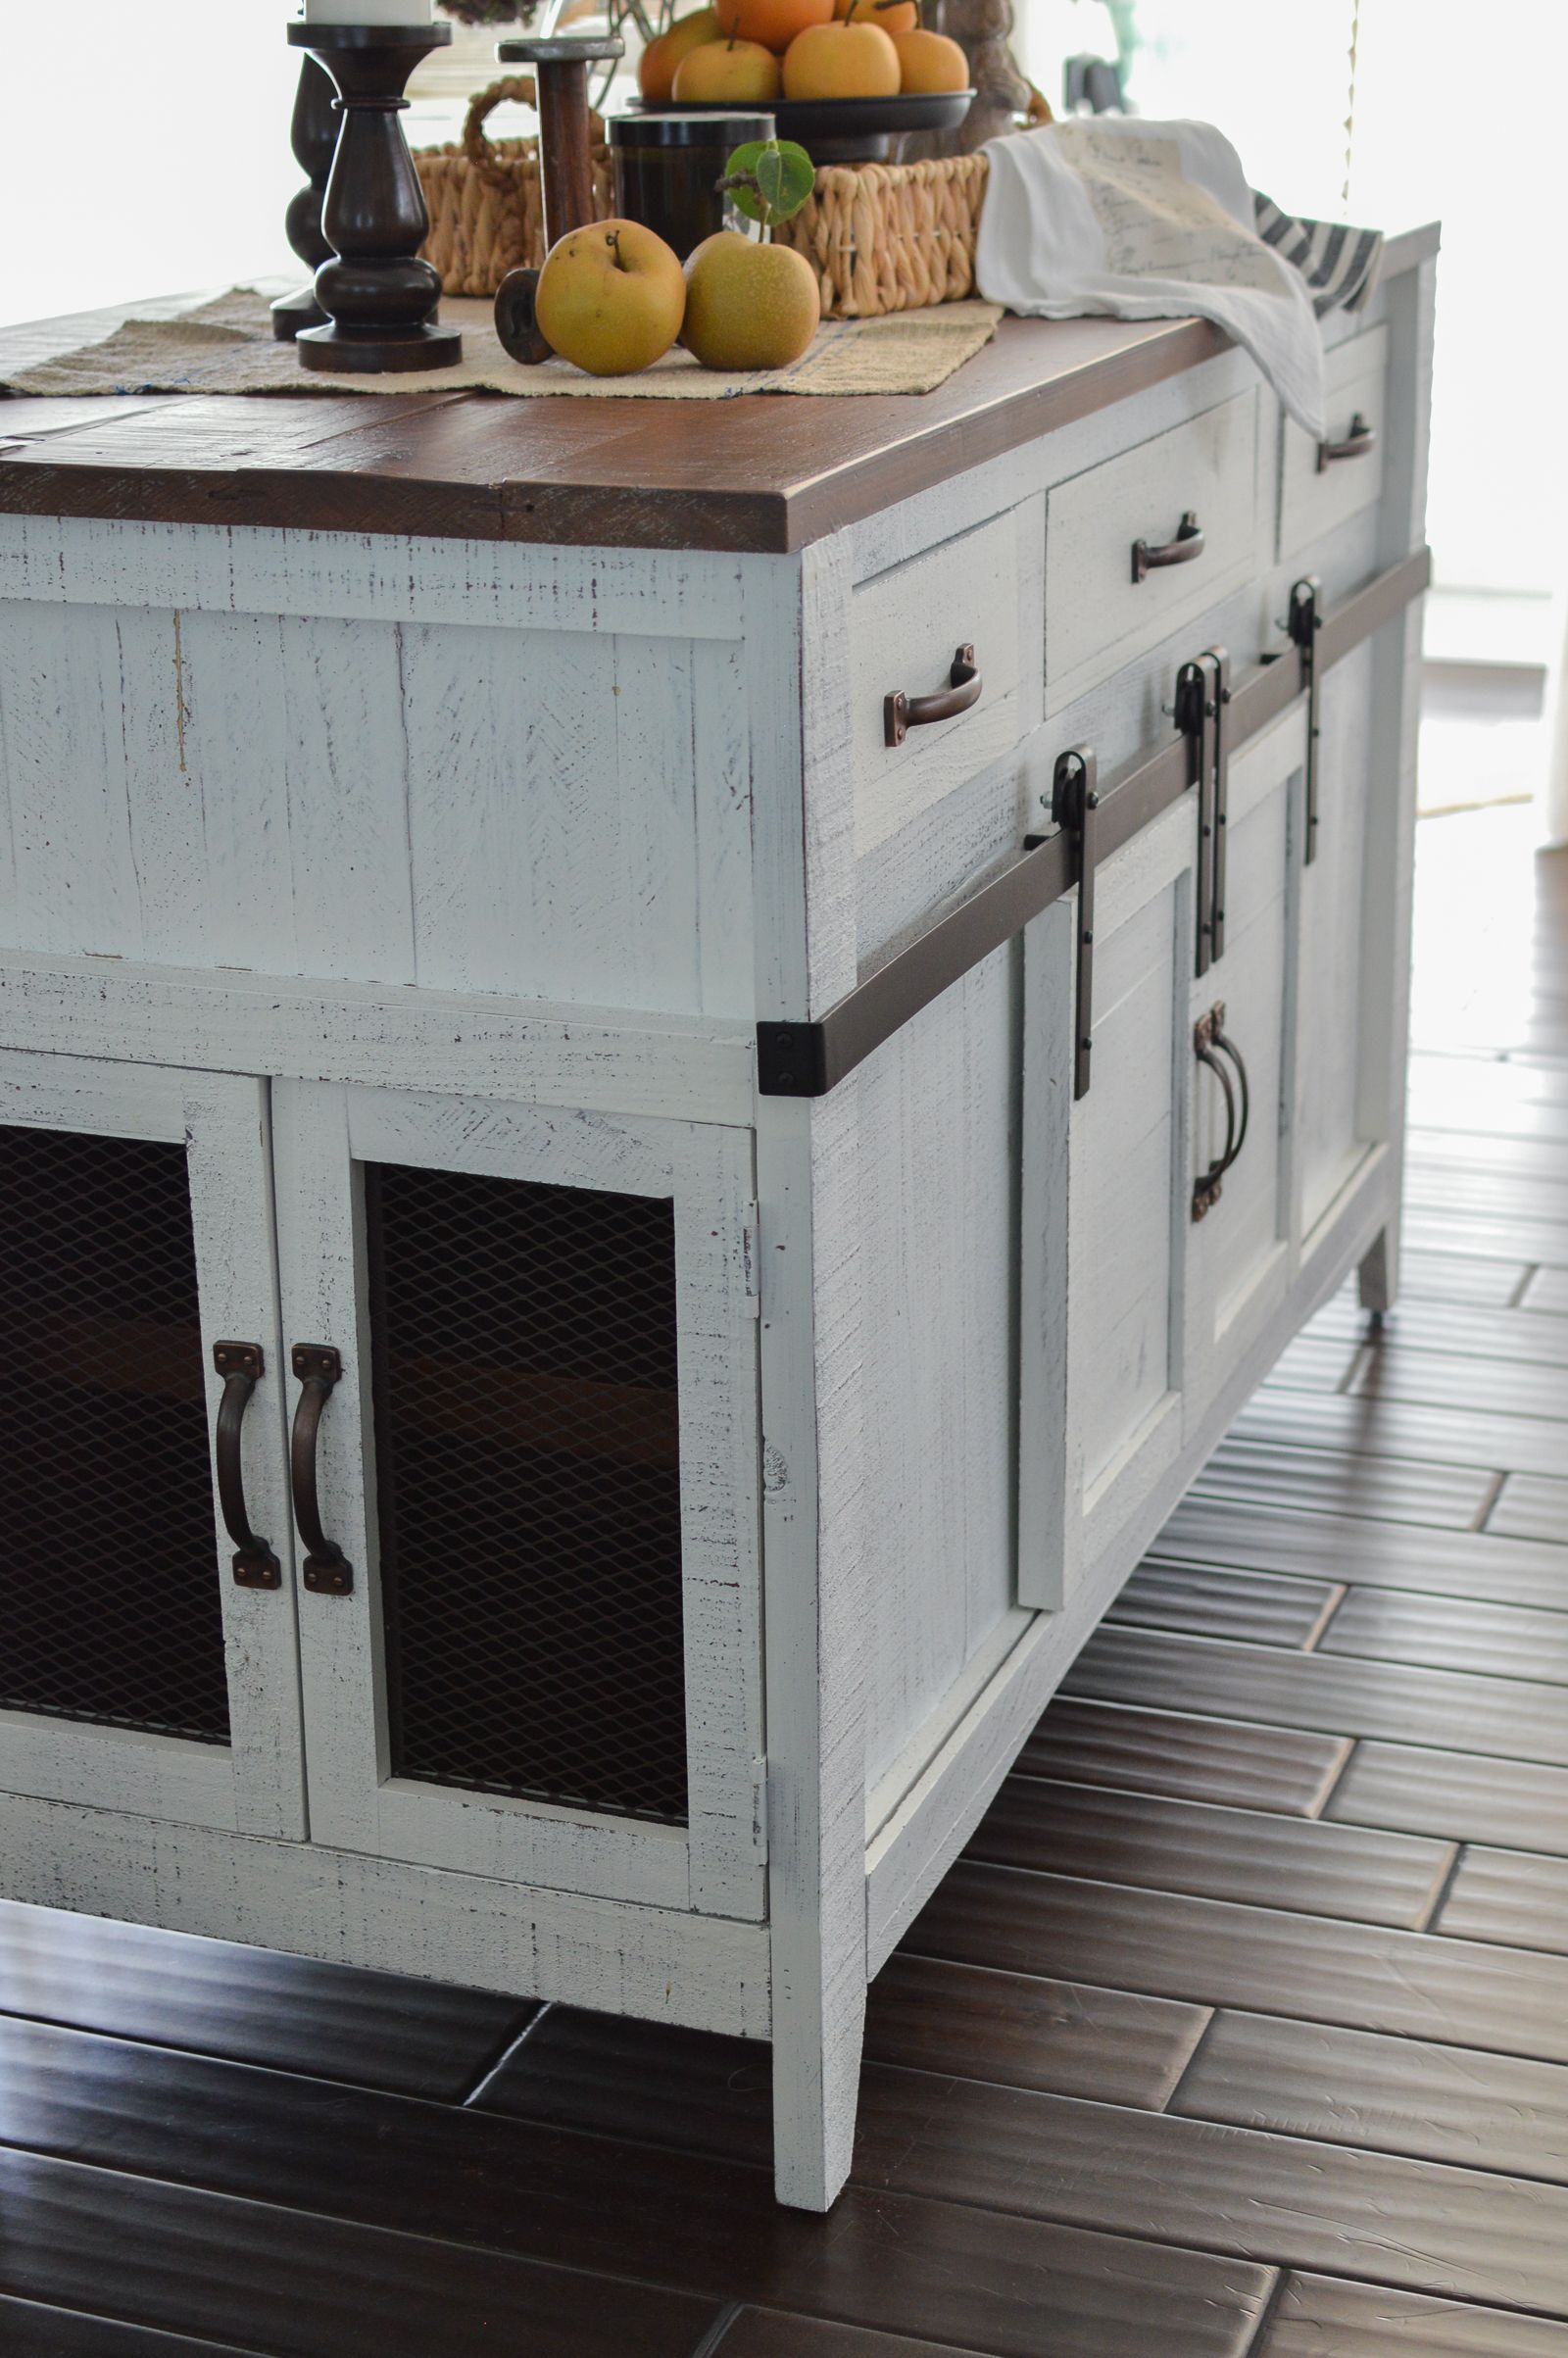 How To Make Your Own Kitchen Island The Diy Life Barn Door Console Diy Furniture Plans Diy Sliding Door